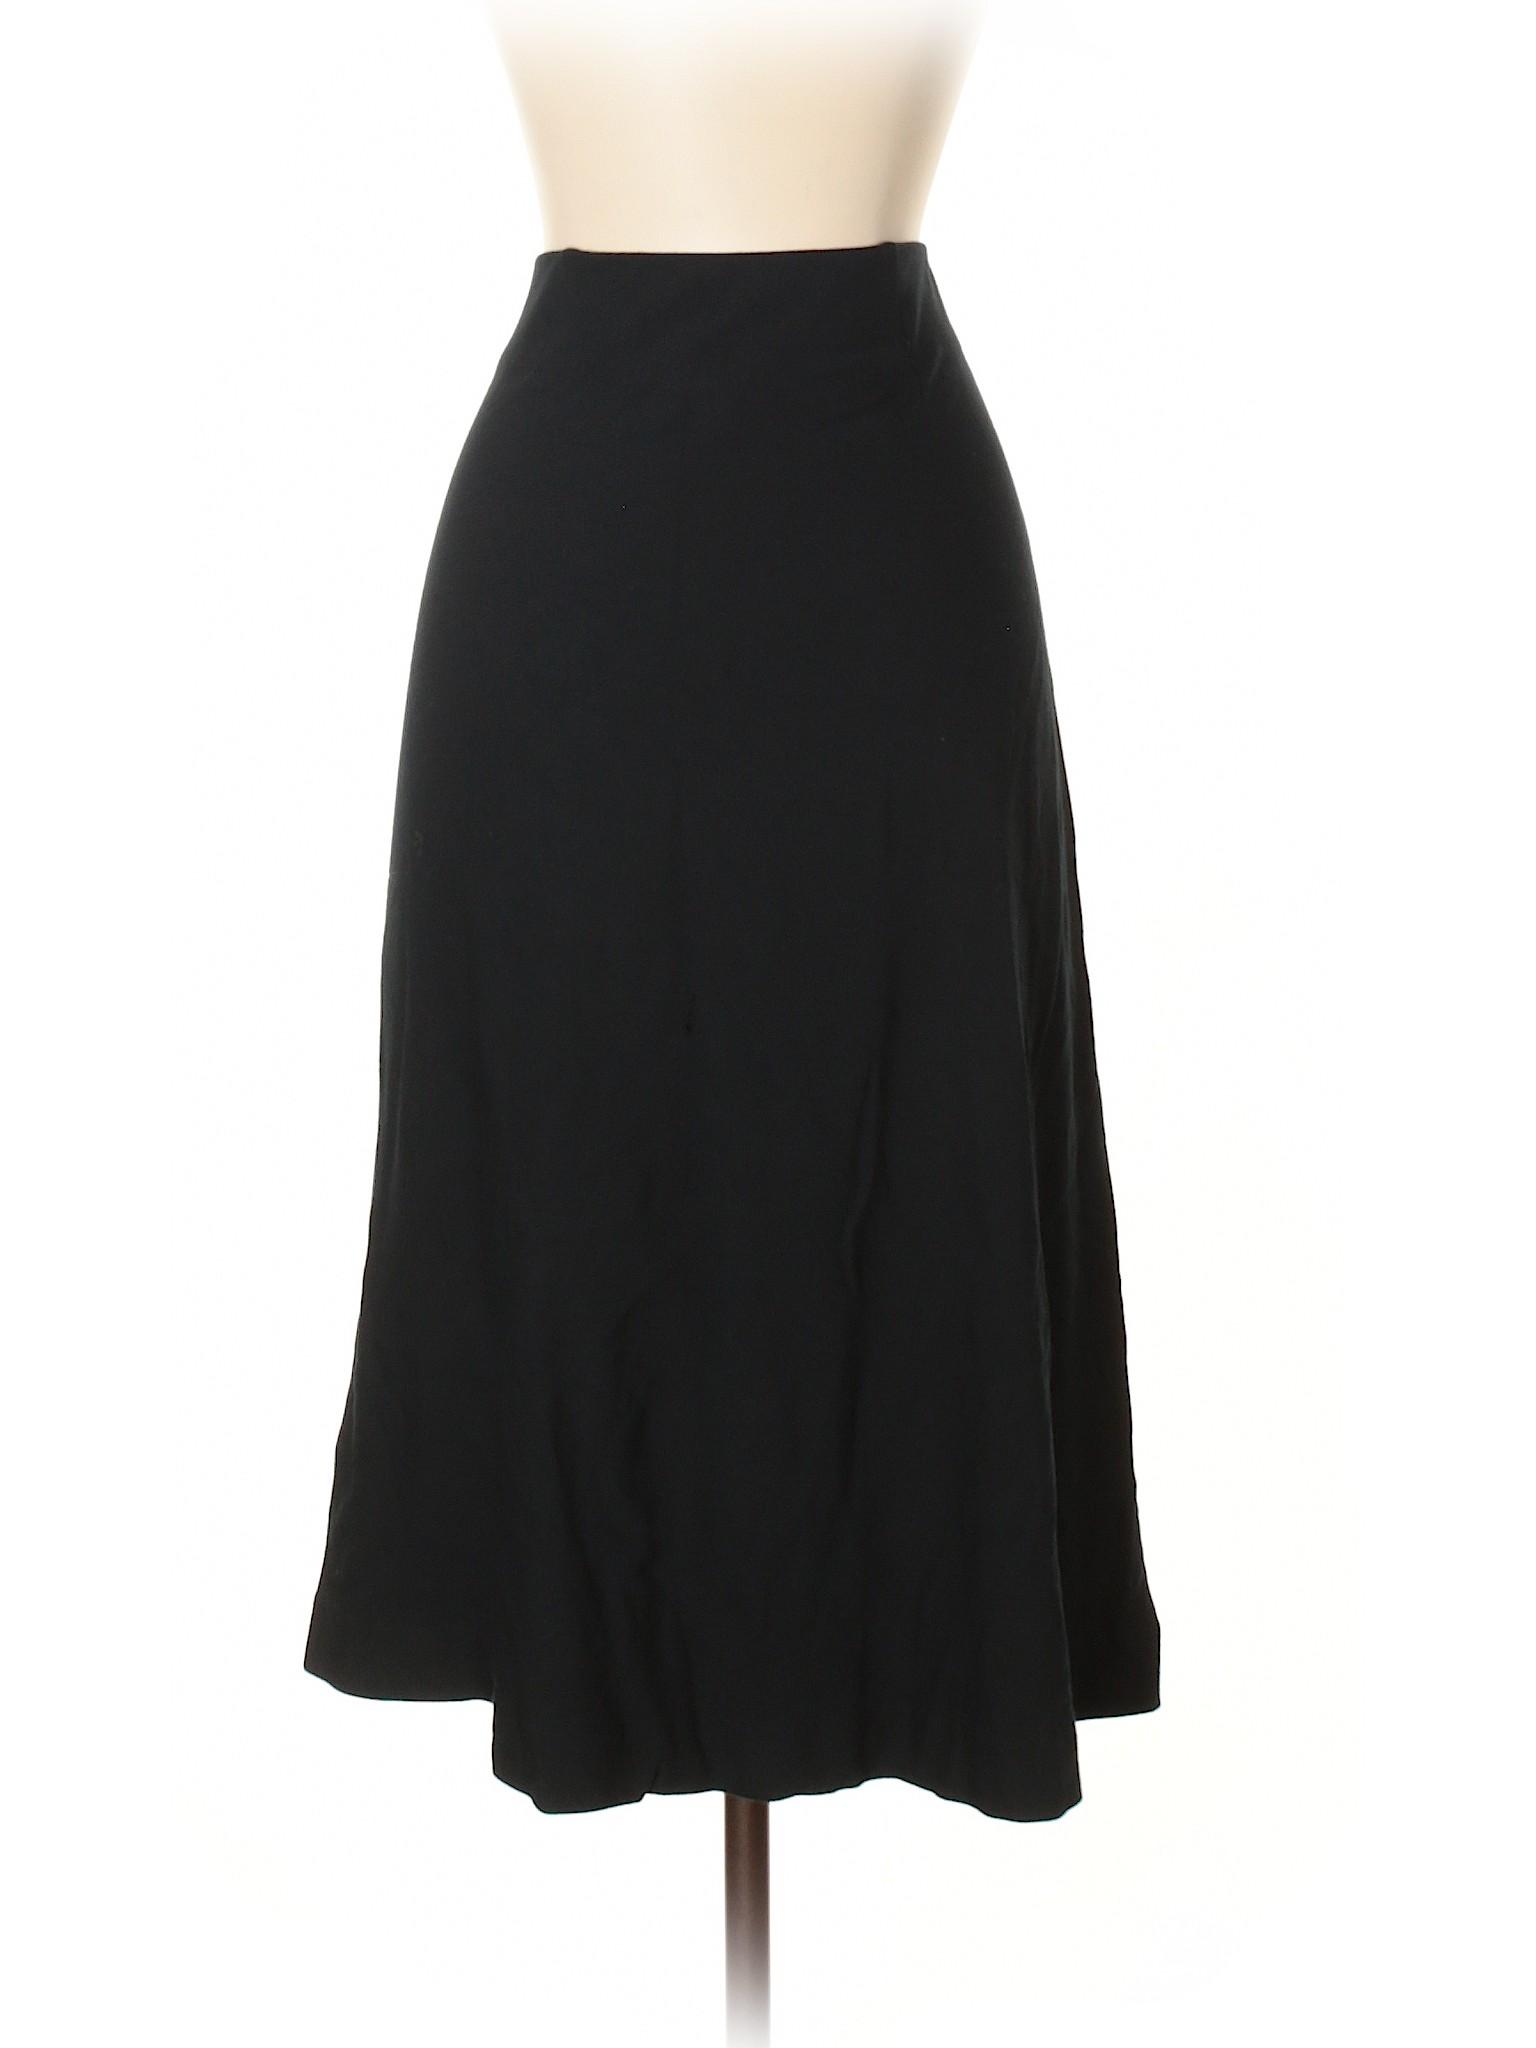 Skirt Boutique Casual Casual Boutique Boutique Skirt Skirt Casual Boutique qwAta